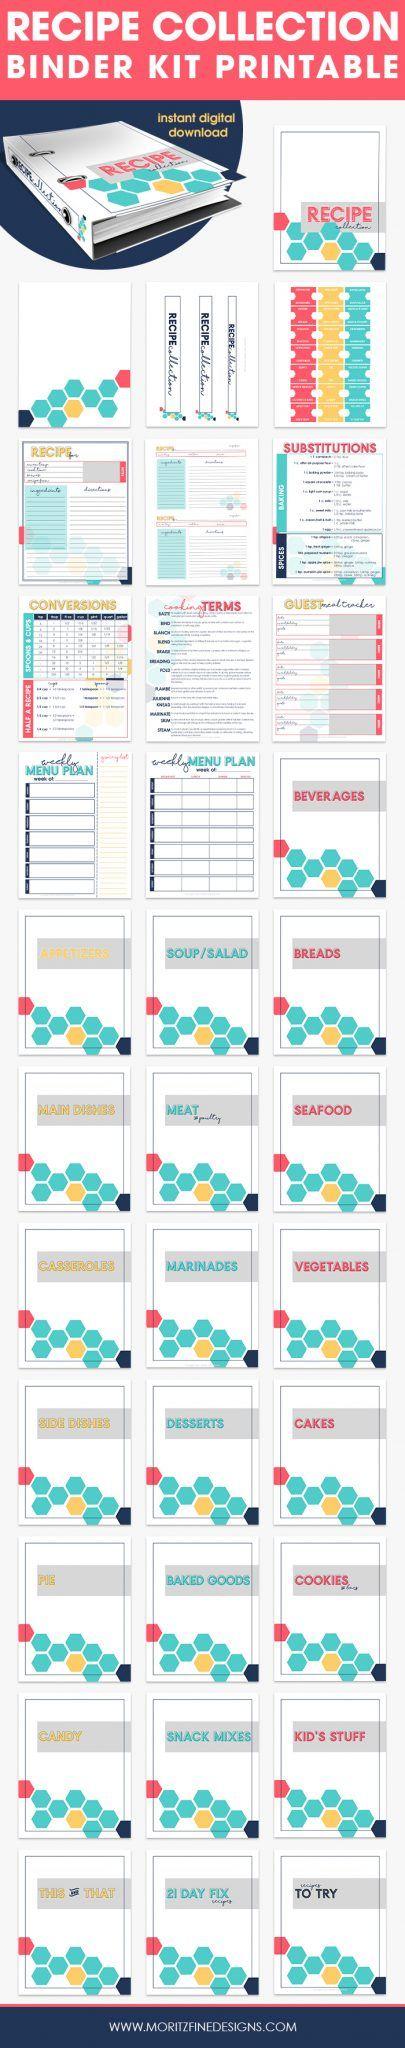 DIY Customizable Recipe Cookbook | Recipe Binder Printable | organize recipes | instant download via @moritzdesigns